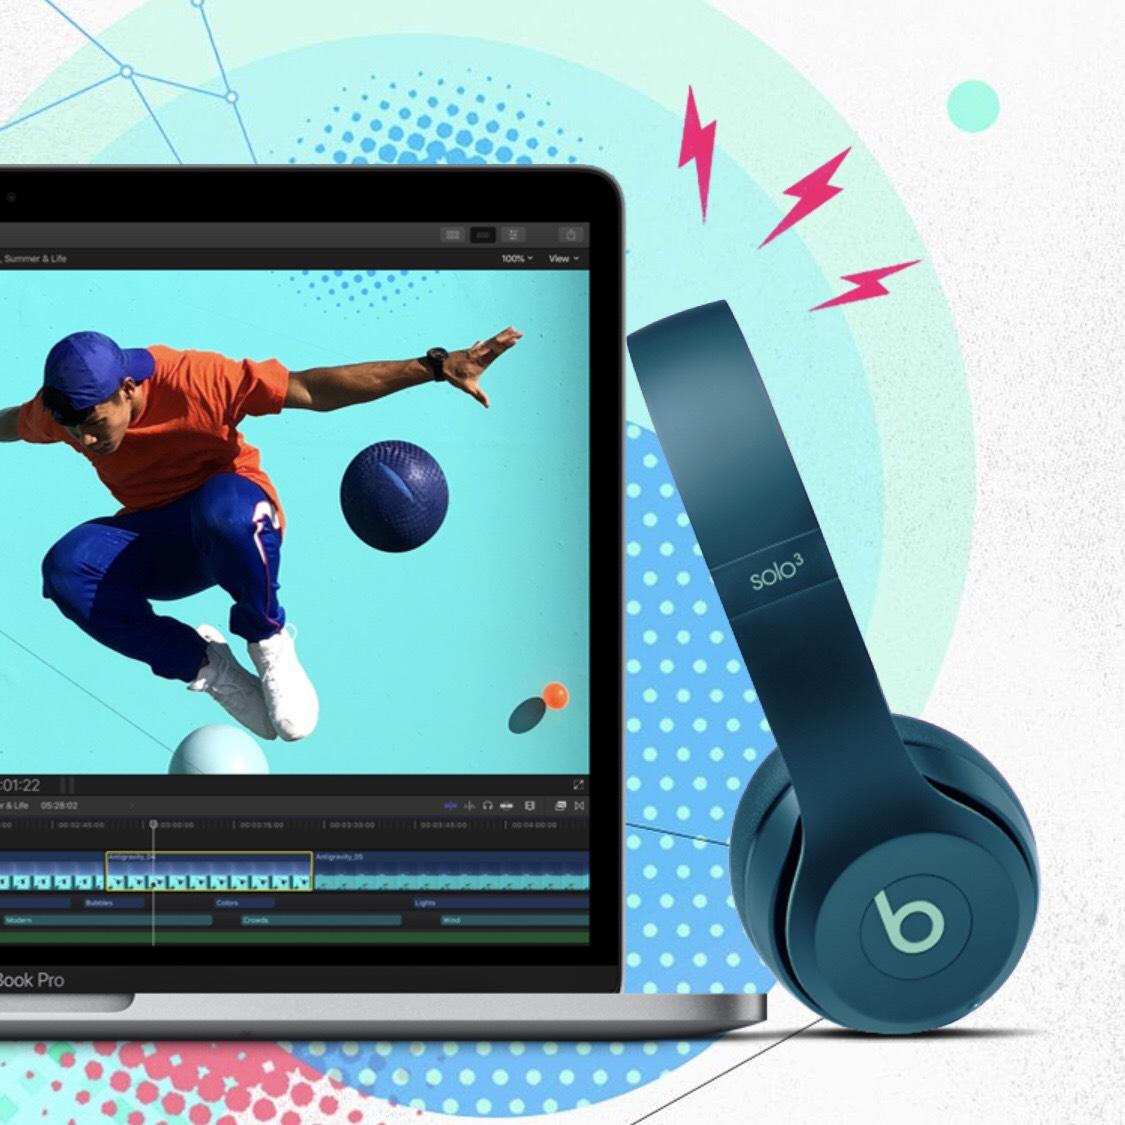 Apple Back to school Aktion: gratis Beats